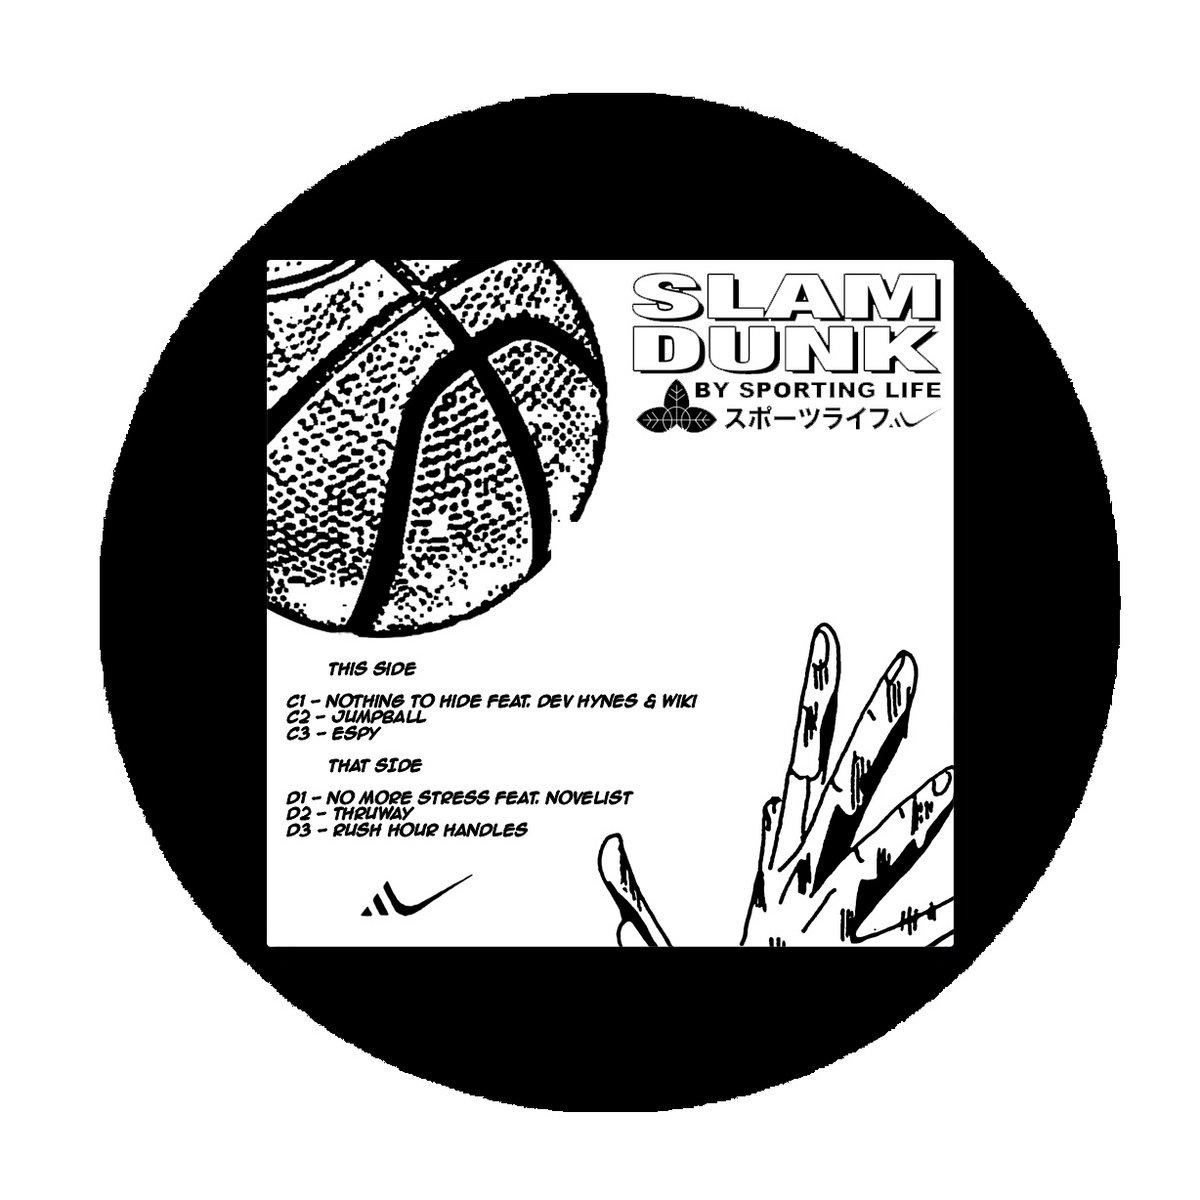 Slam Dunk - Vinyl LP | Sporting Life